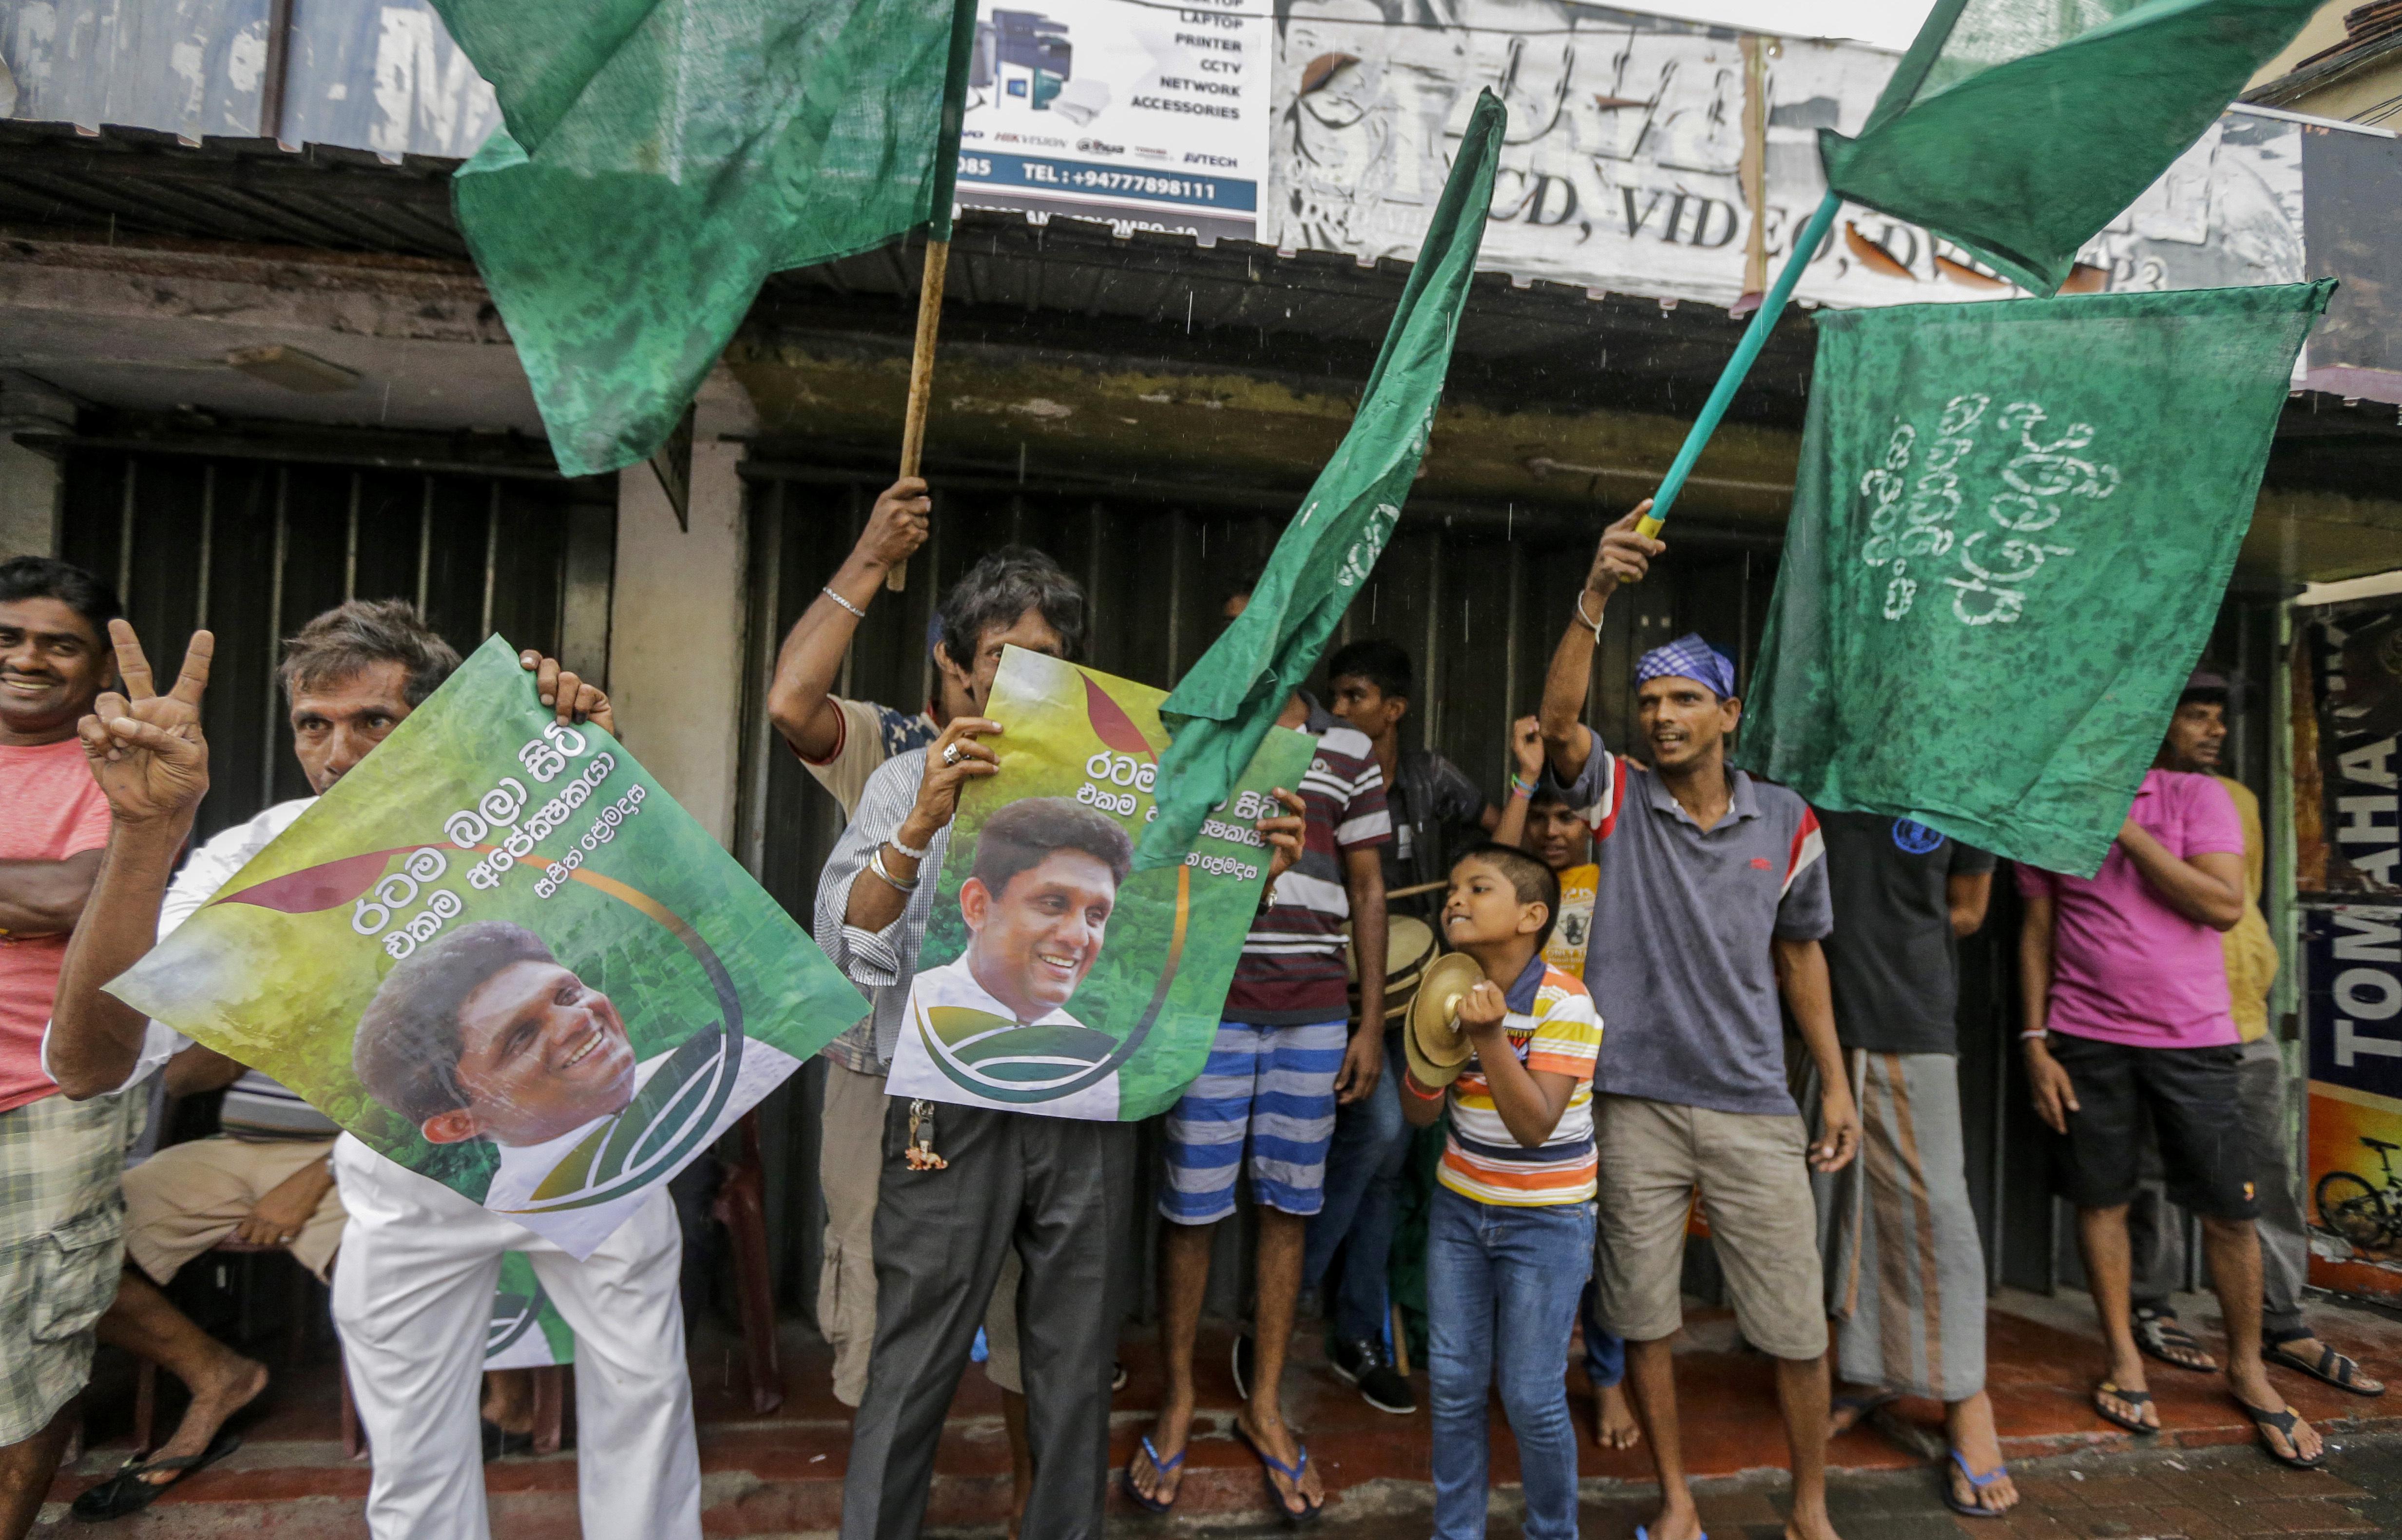 Supporters of Sri Lanka's governing party Presidential candidate Sajith Premadasa celebrate at the end of voting in Colombo, Sri Lanka, Saturday, November 16 , 2019